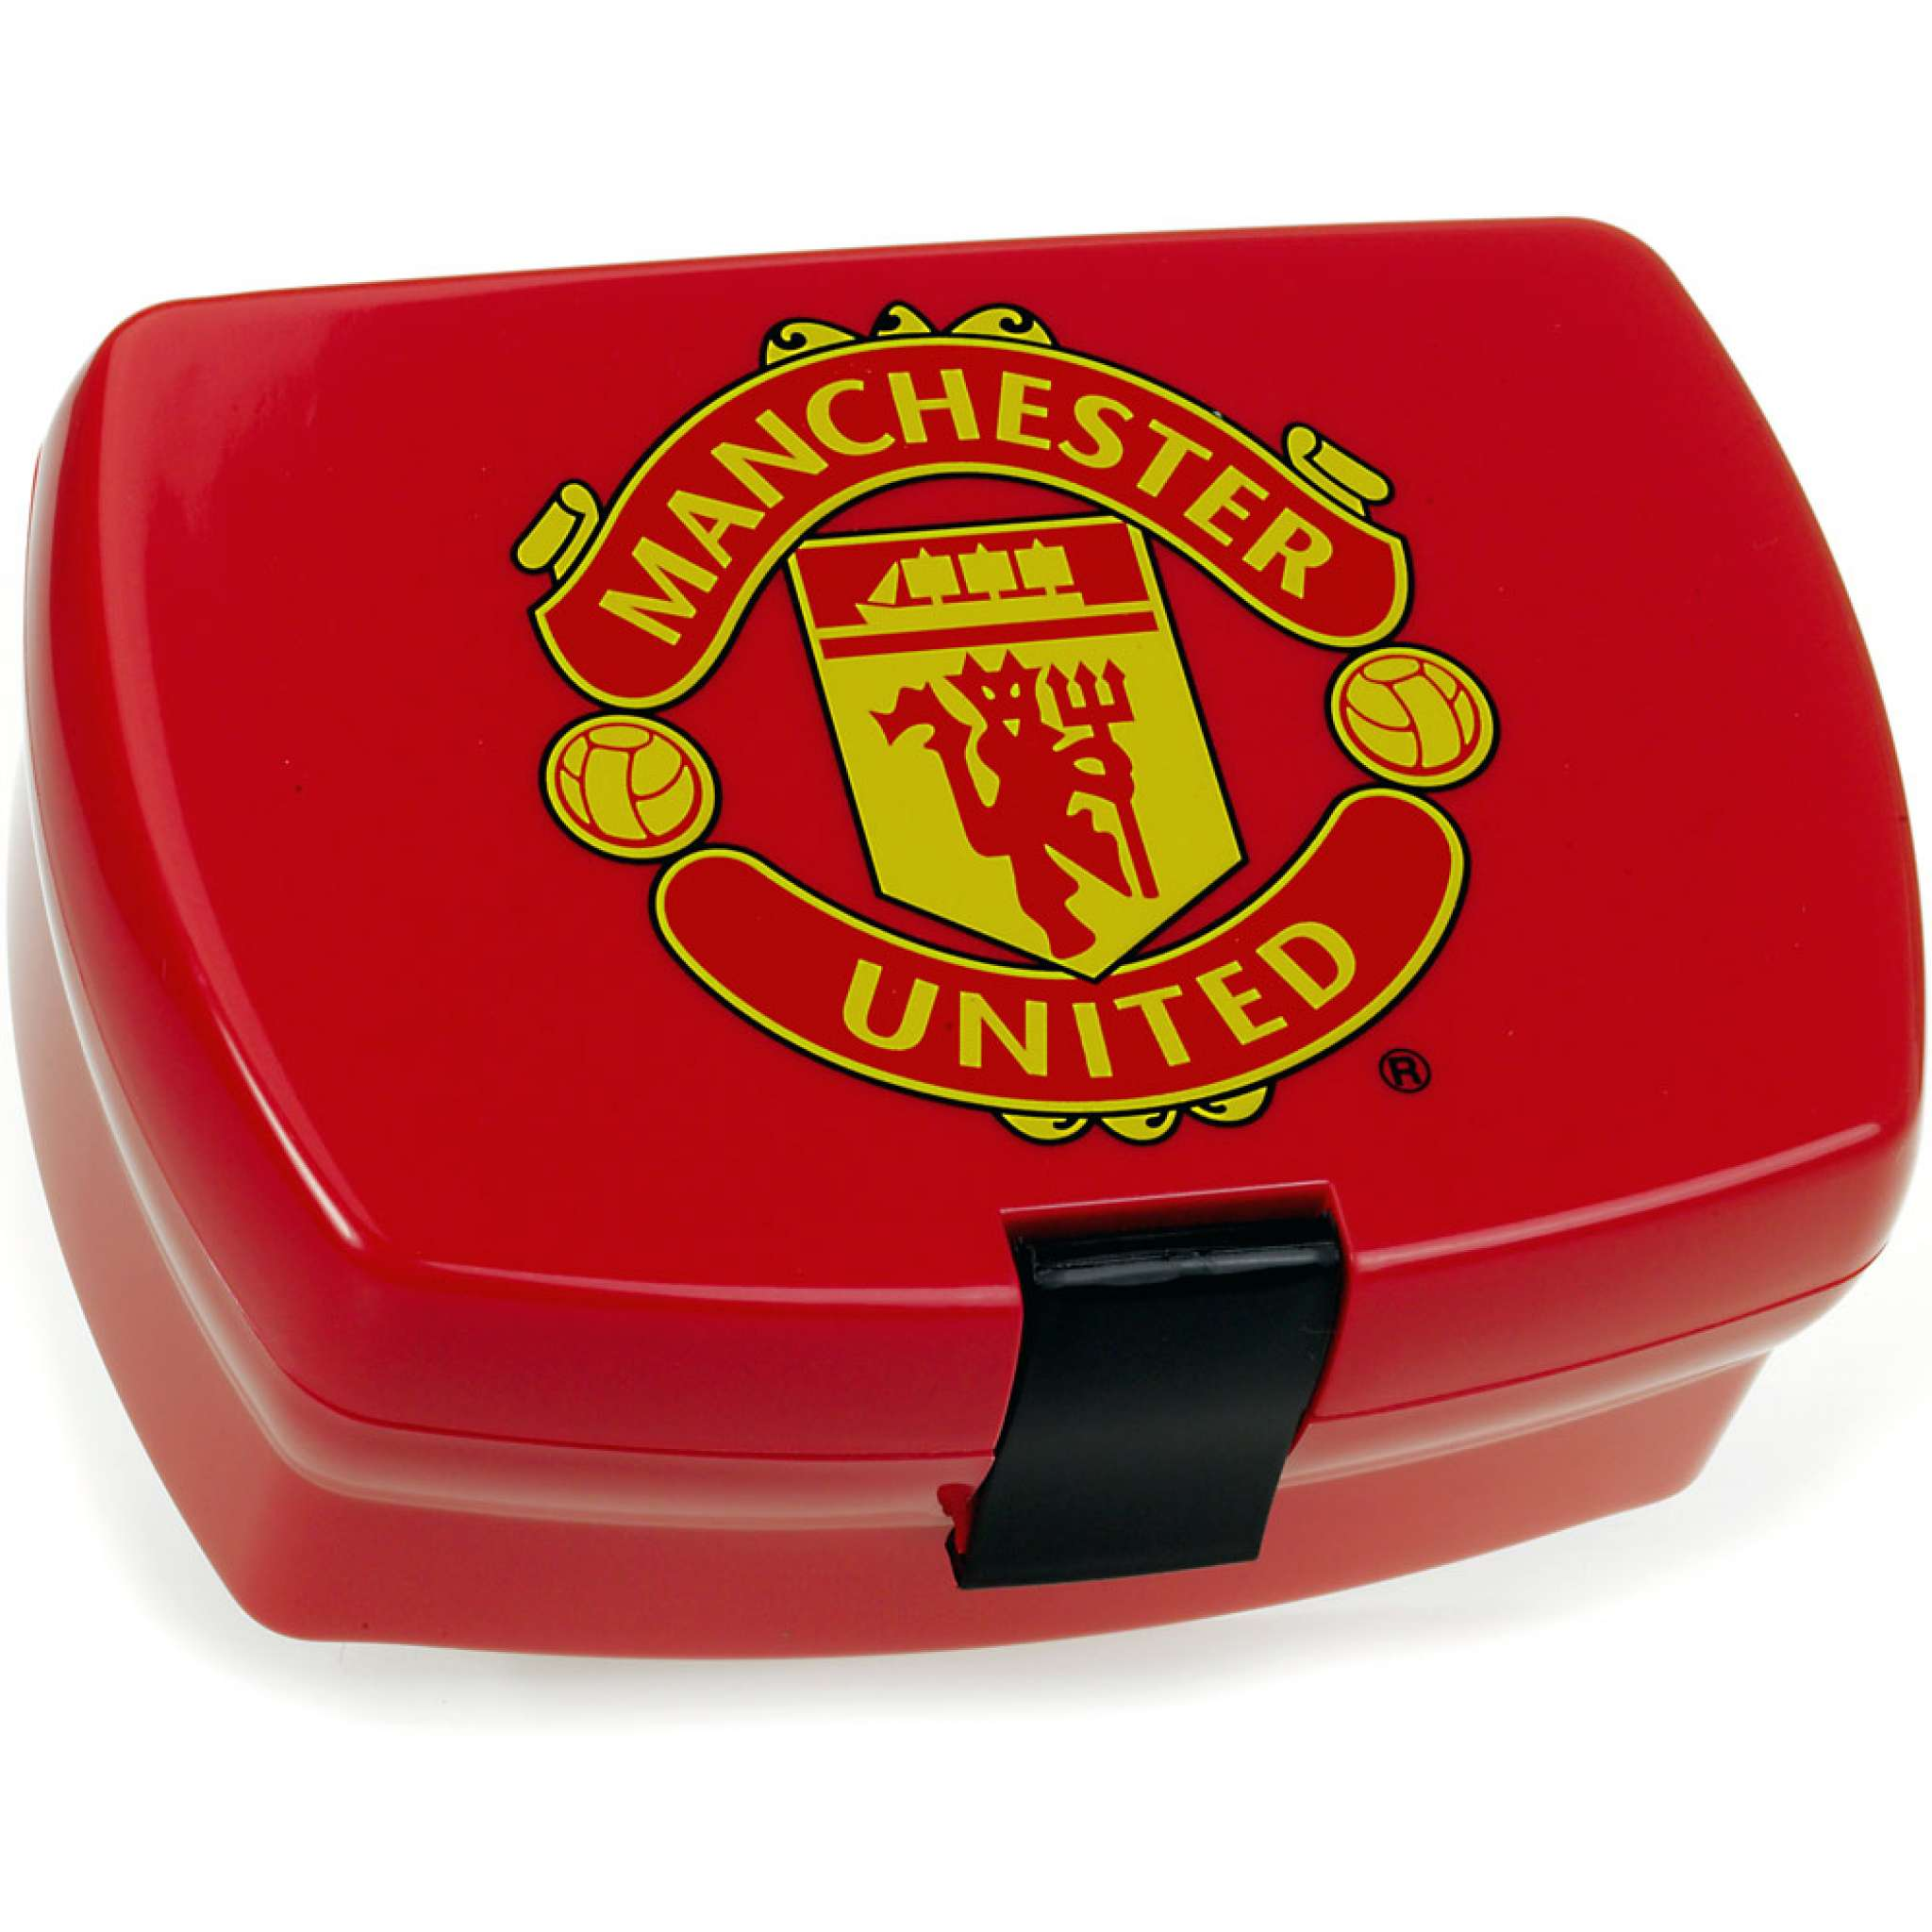 Brotdose, Manchester United